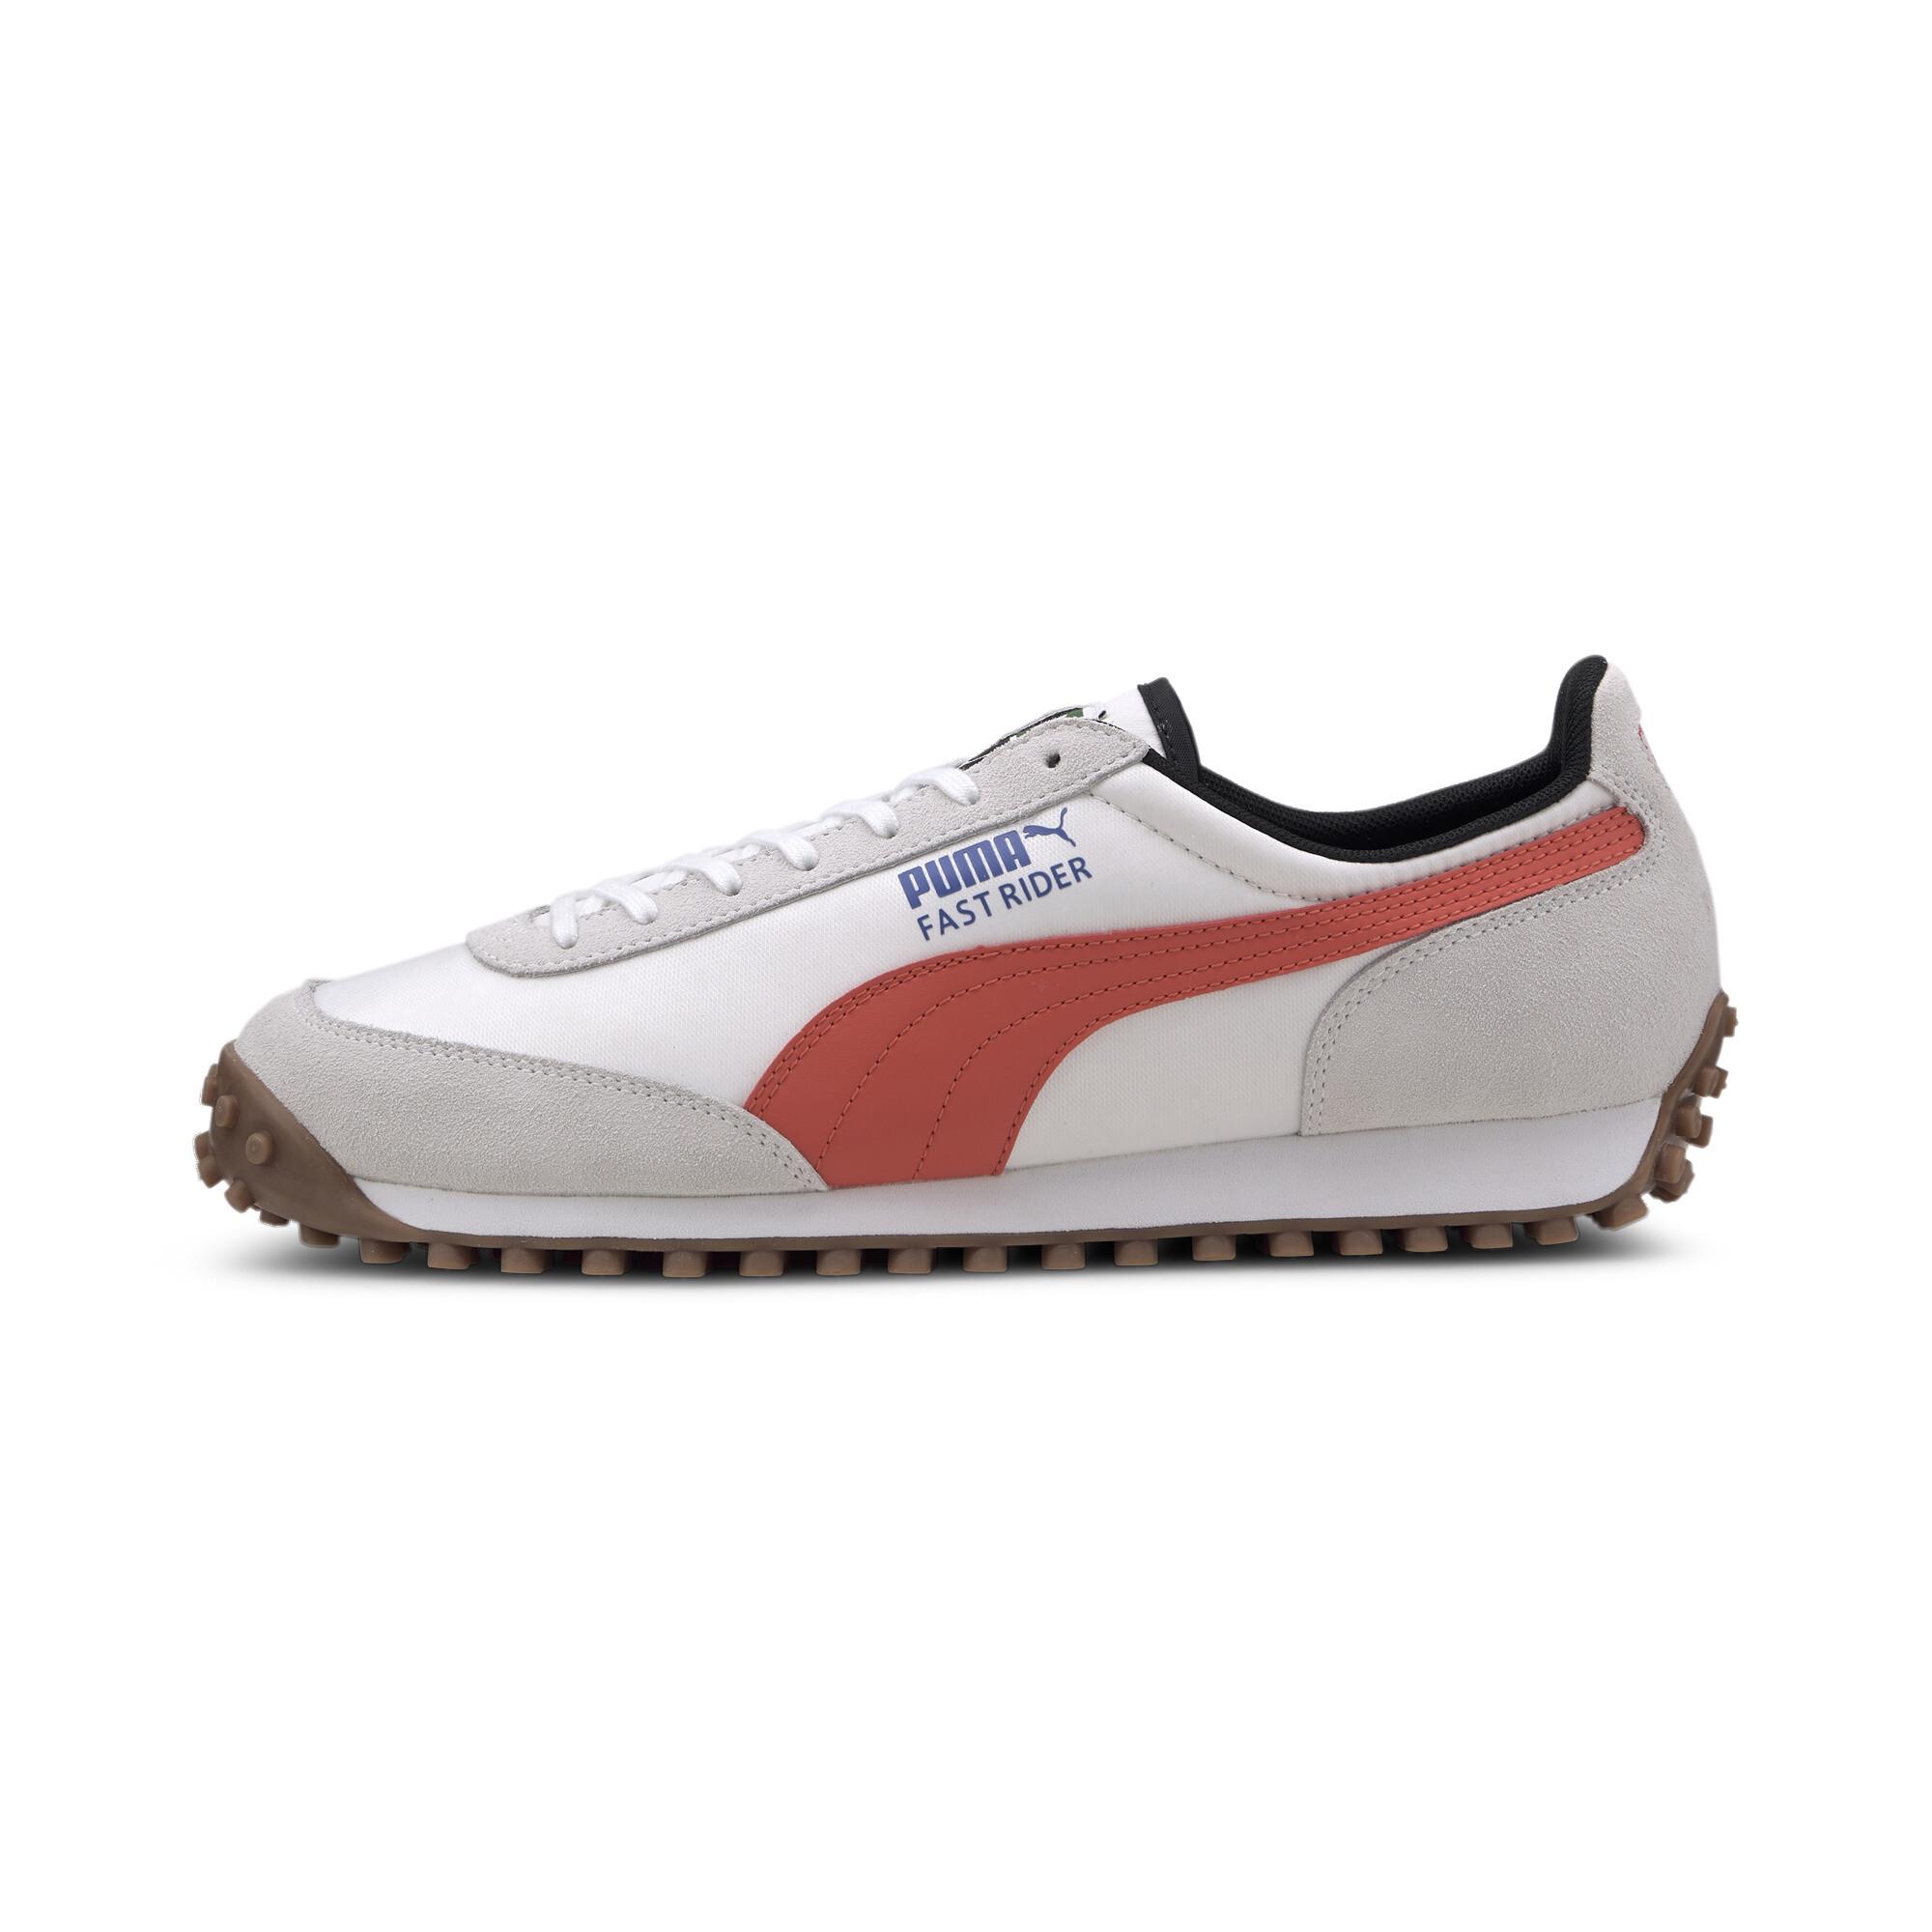 PUMA-Men-039-s-Fast-Rider-Source-Sneakers thumbnail 11